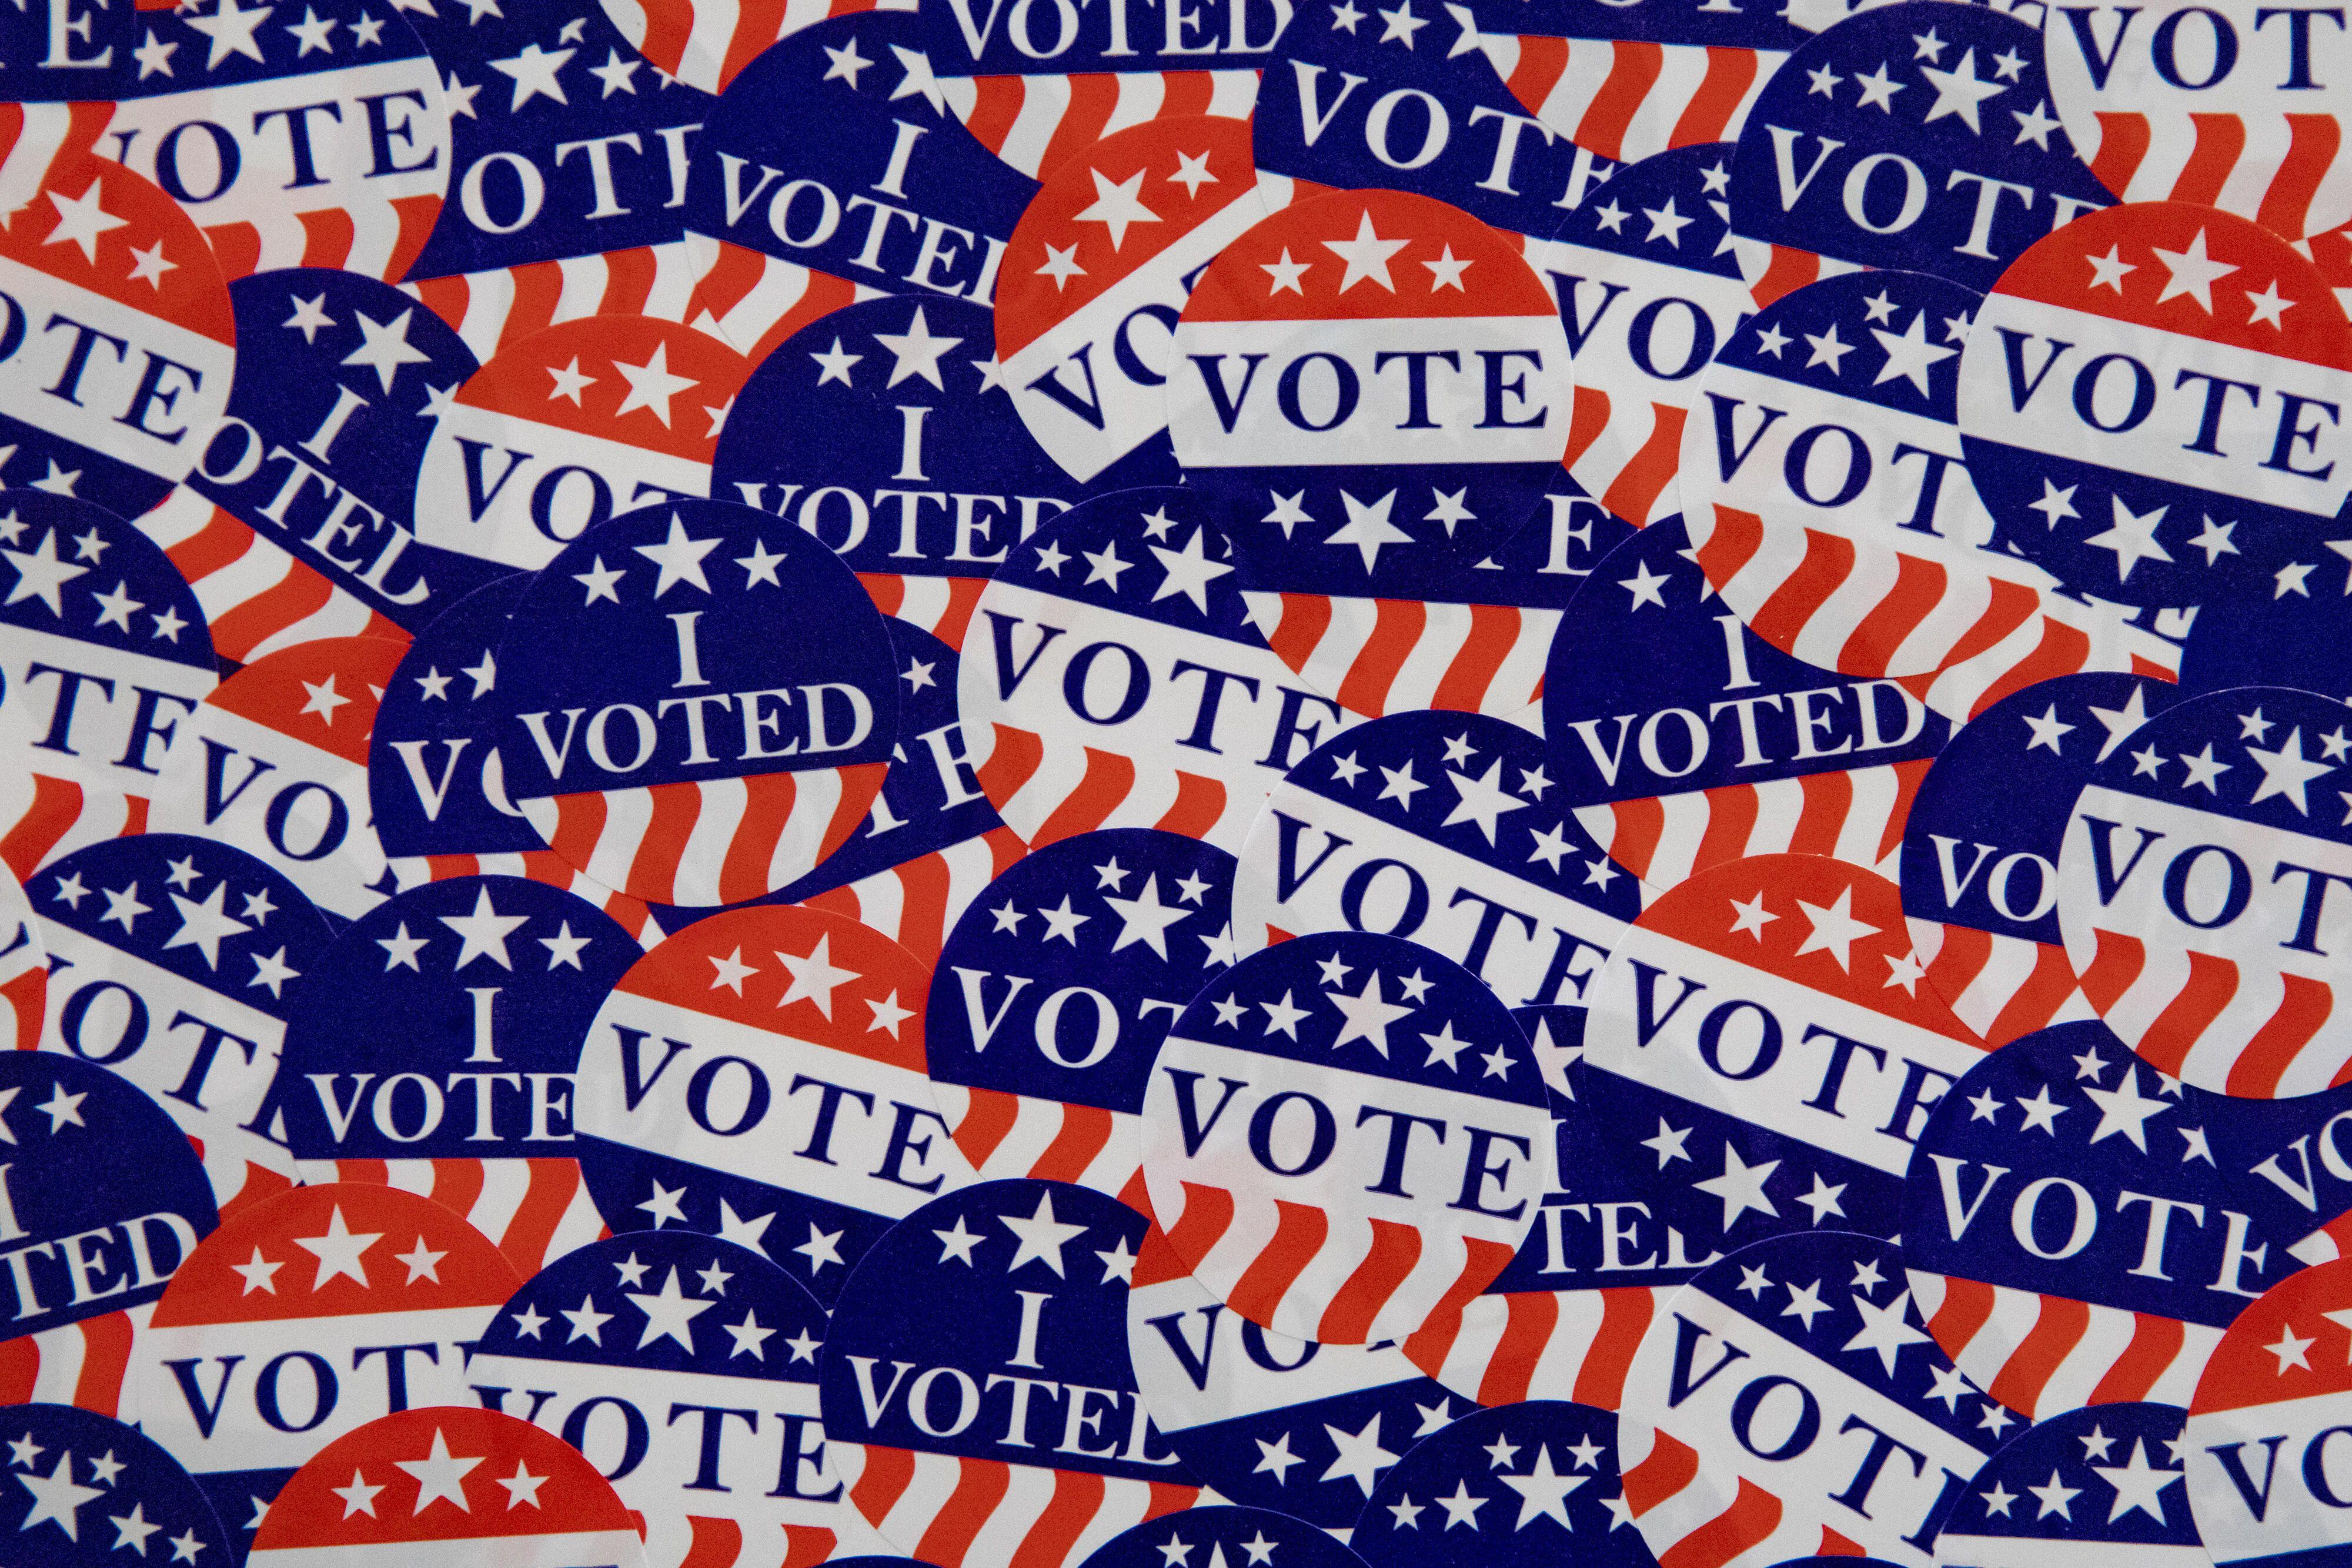 vote-elections-2020-trump-pence-biden-harris-0656